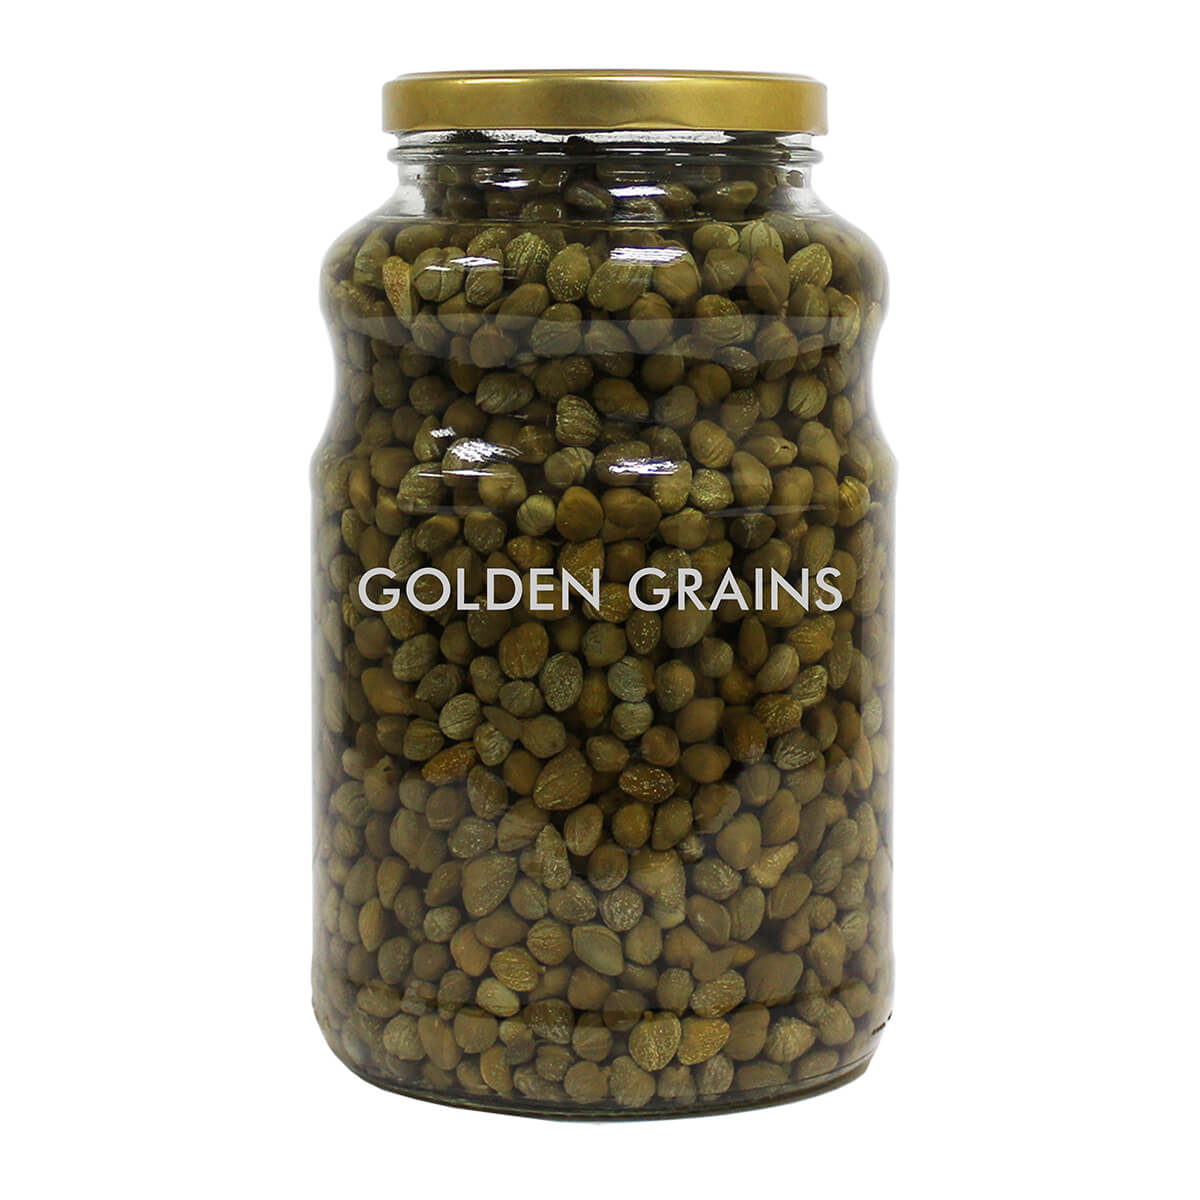 Golden Grains Dubai Export - Mediterranea - Capers - Back.jpg